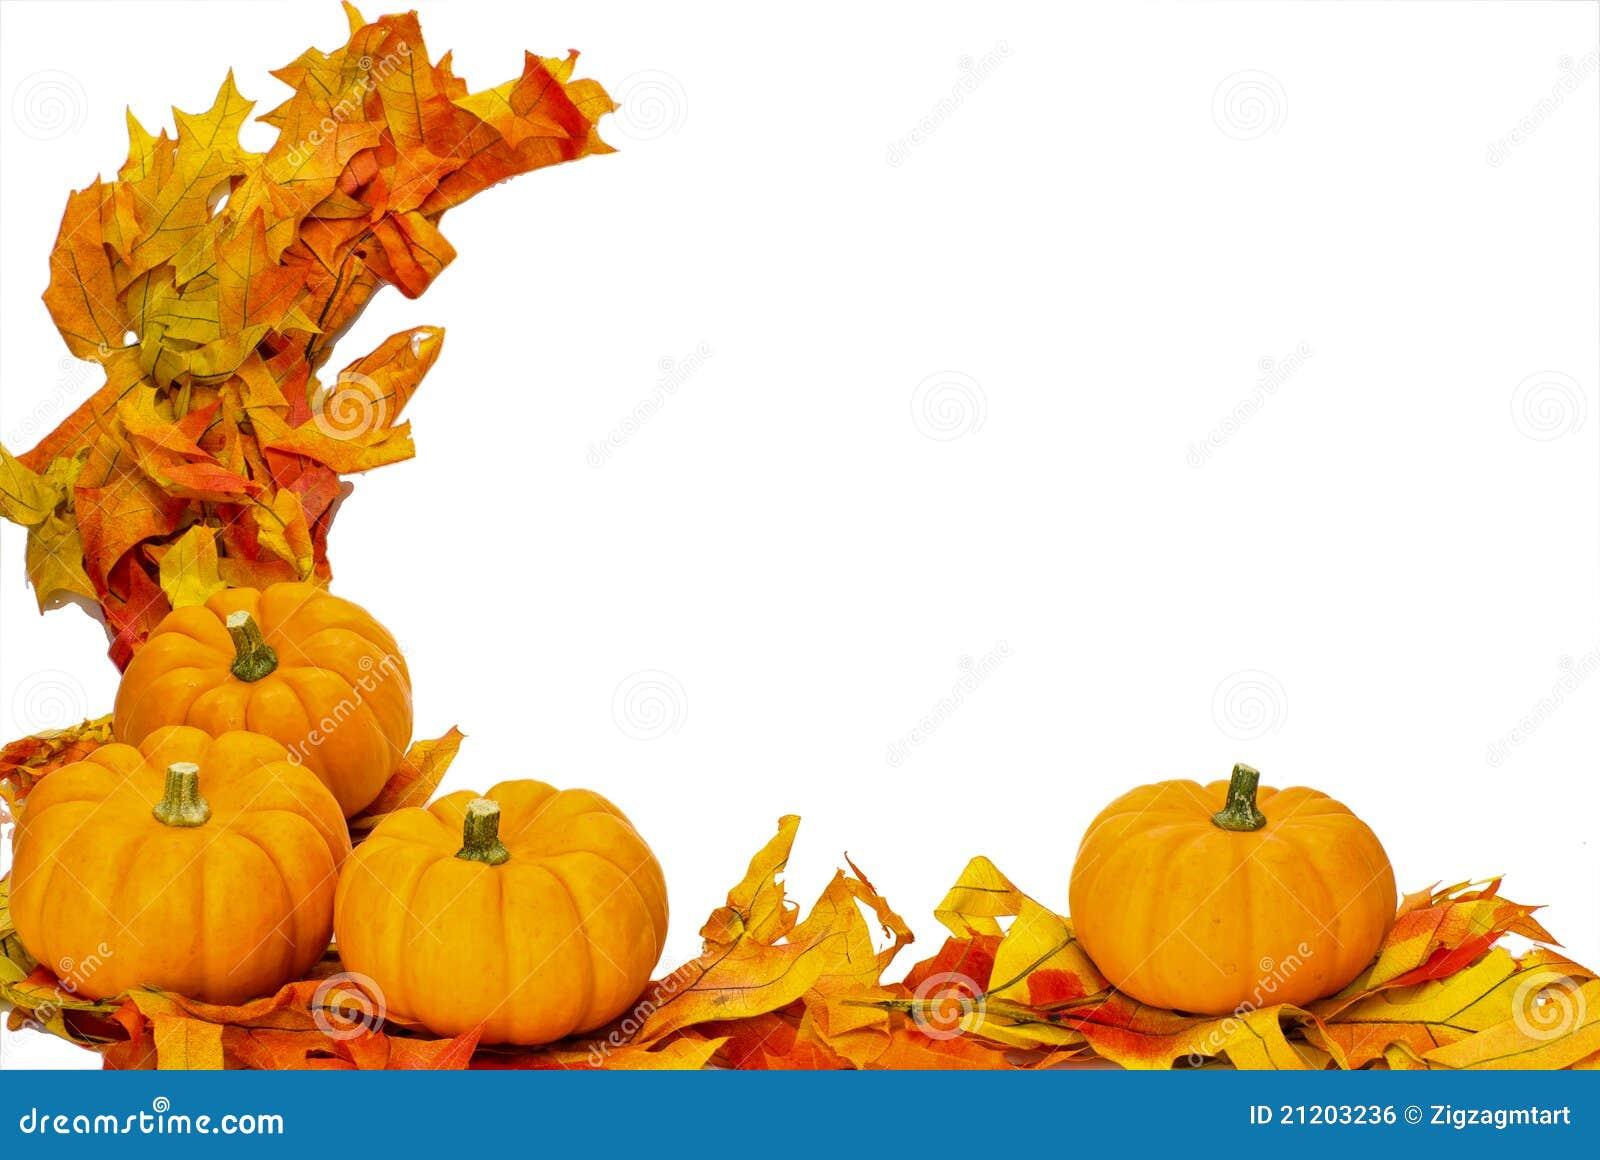 Halloween decoration clipart - Decoration Fall Halloween